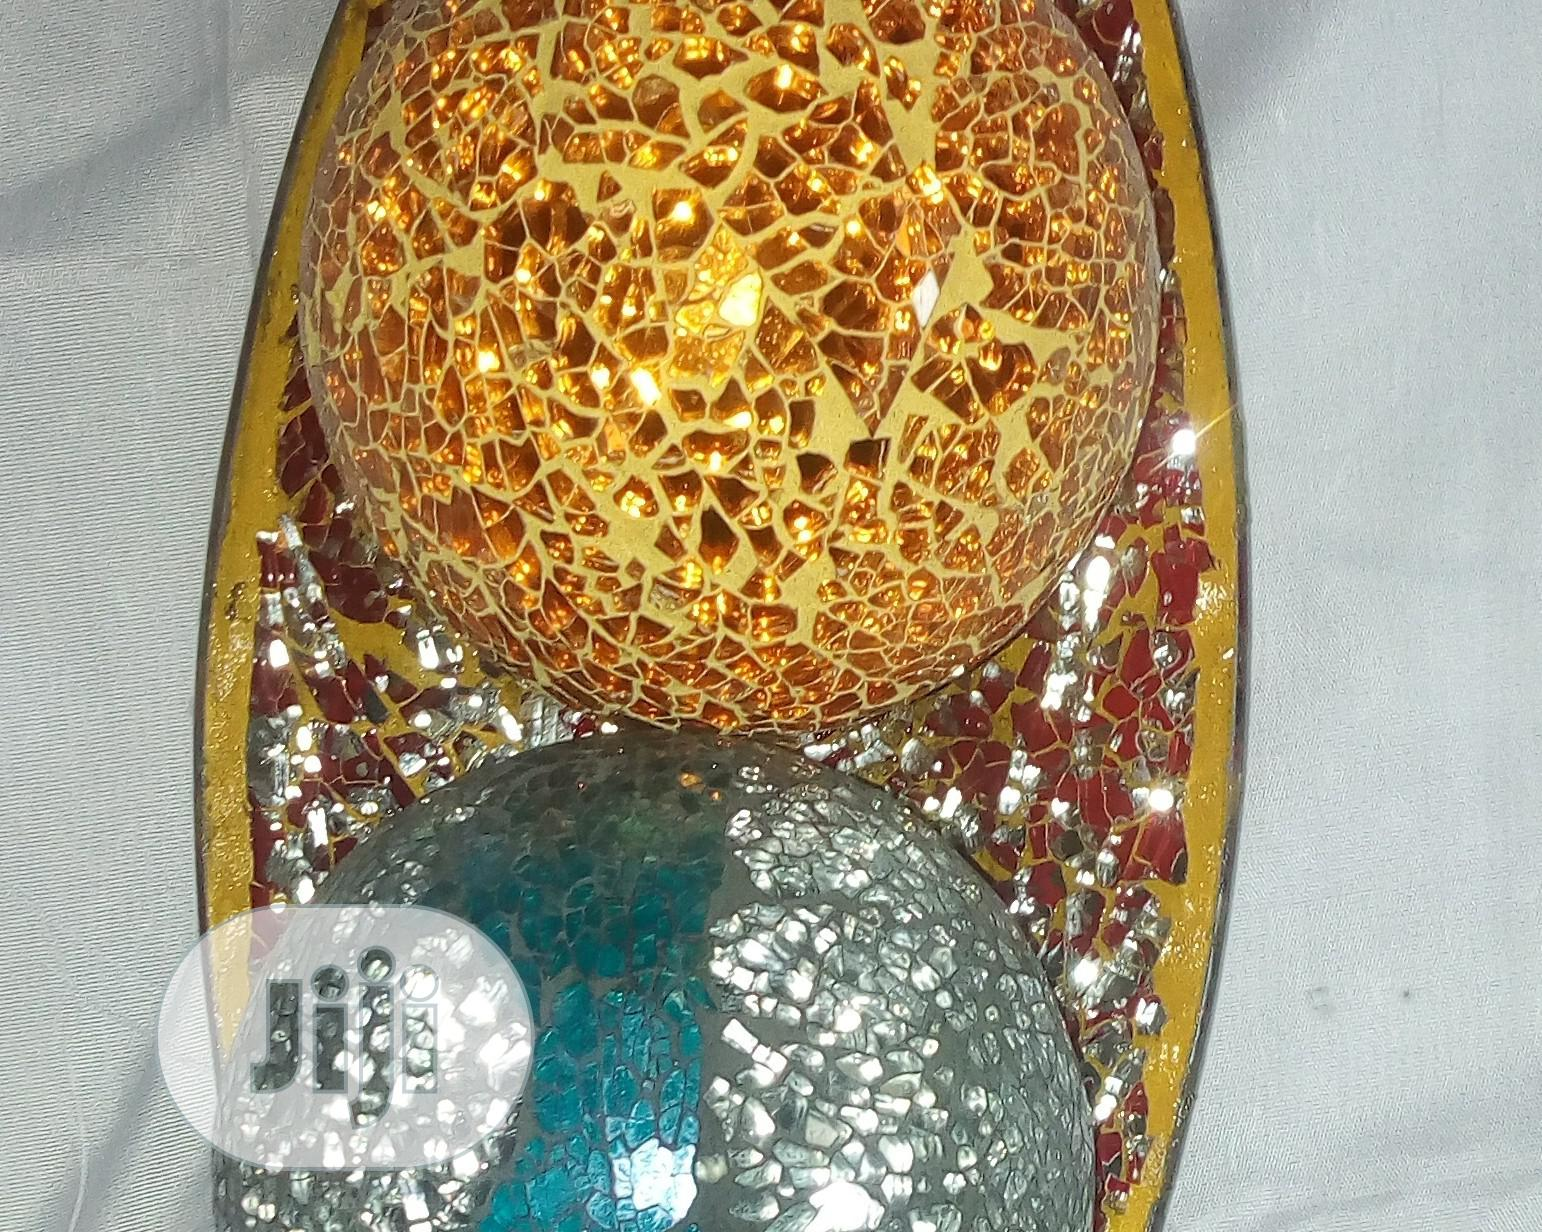 Classy Center Table Decor | Arts & Crafts for sale in Lagos Island (Eko), Lagos State, Nigeria